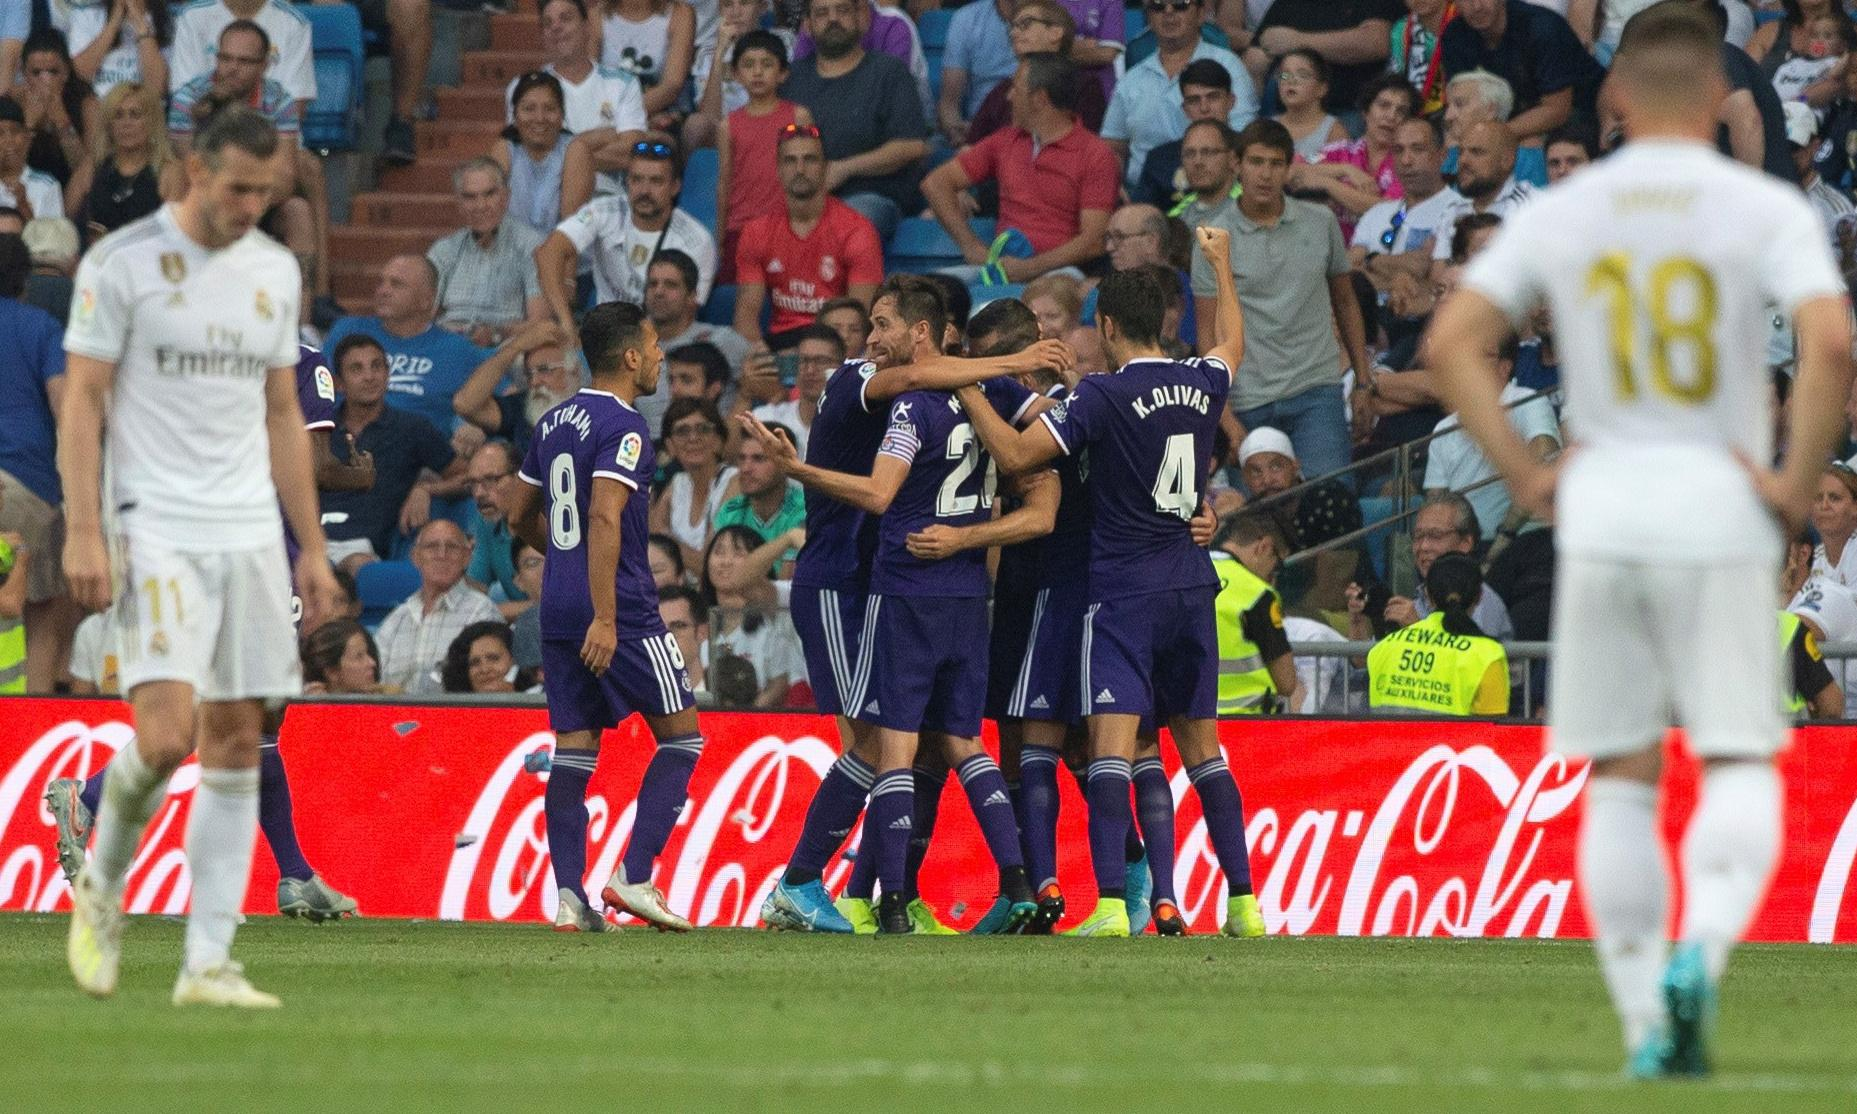 European roundup: Guardiola stuns Madrid with late Valladolid equaliser